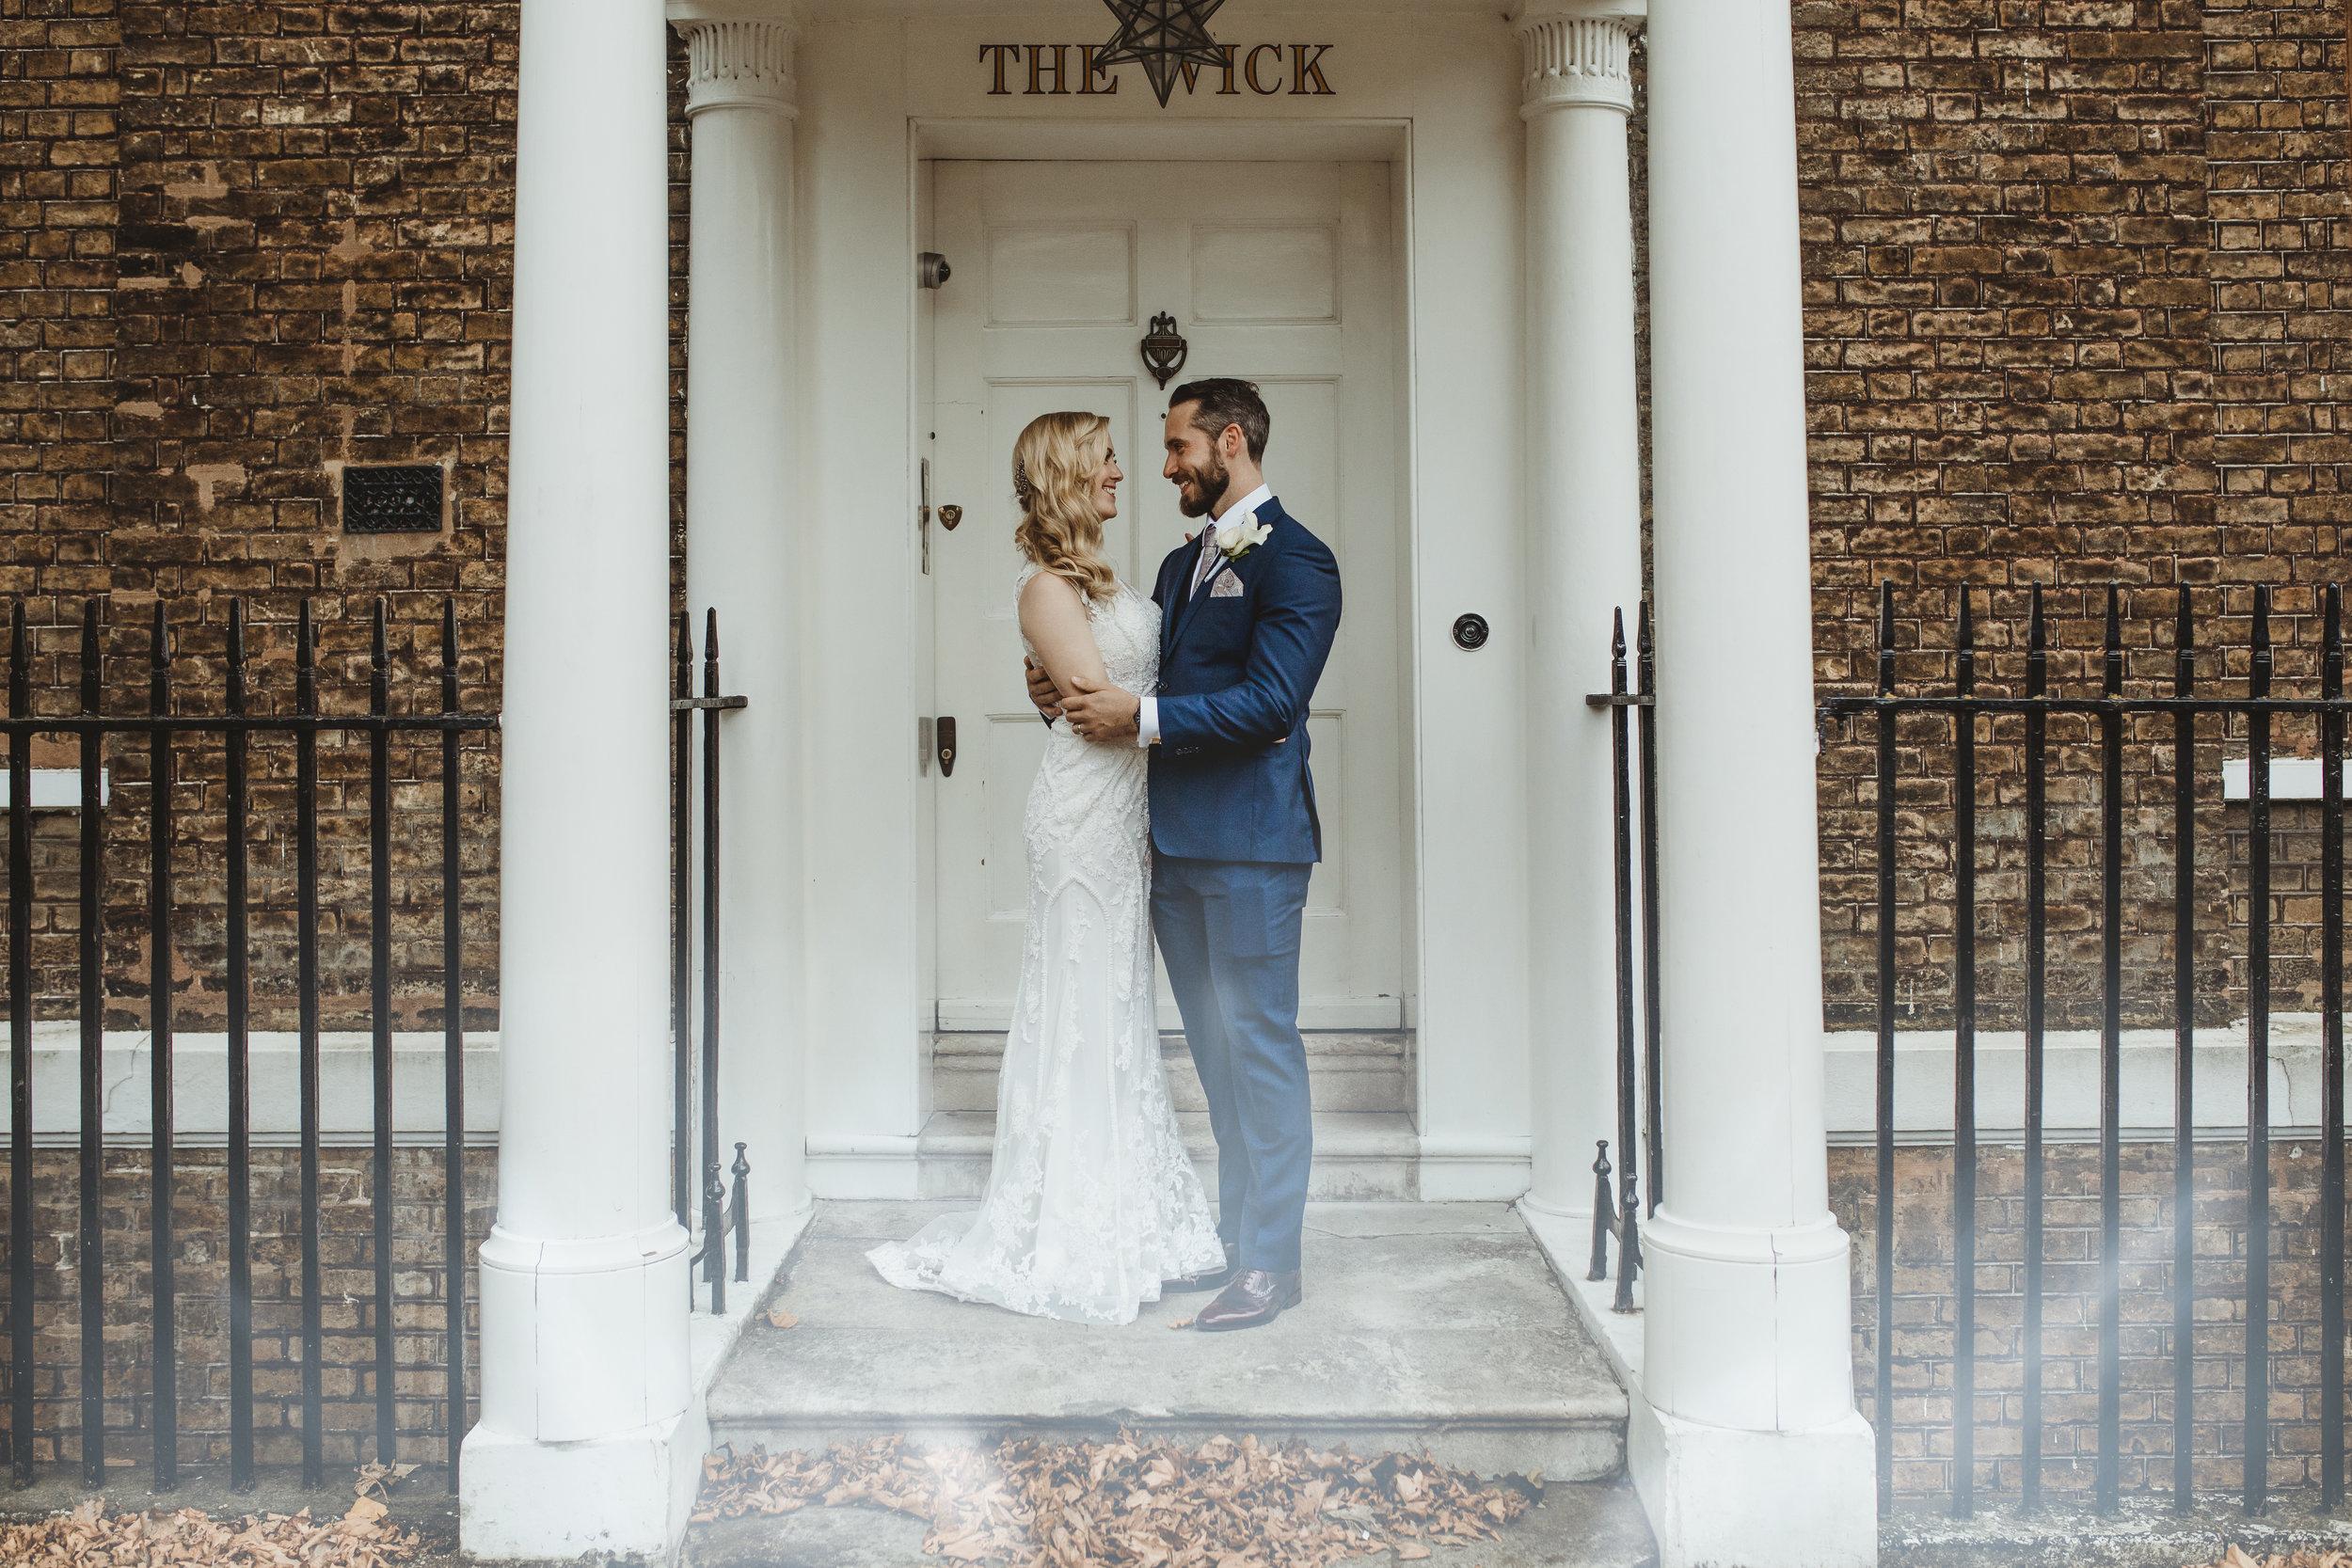 R&S_LONDON_WEDDING_PHOTOGRAPHY_RICHMONDHILL-667.JPG